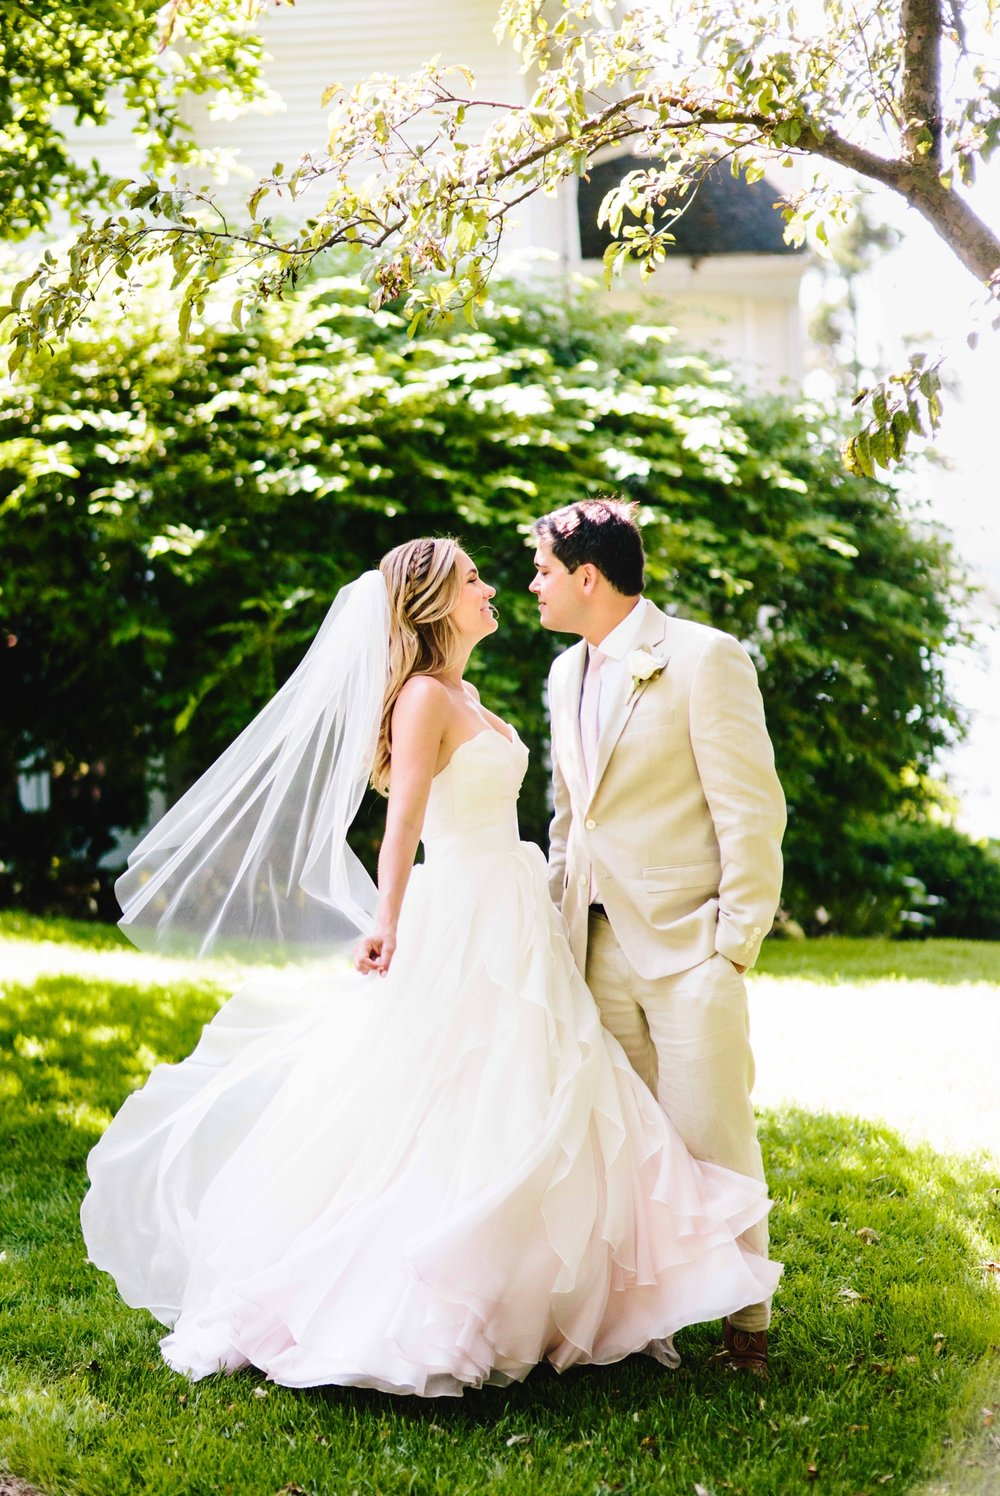 chicago-fine-art-wedding-photography-trenga18